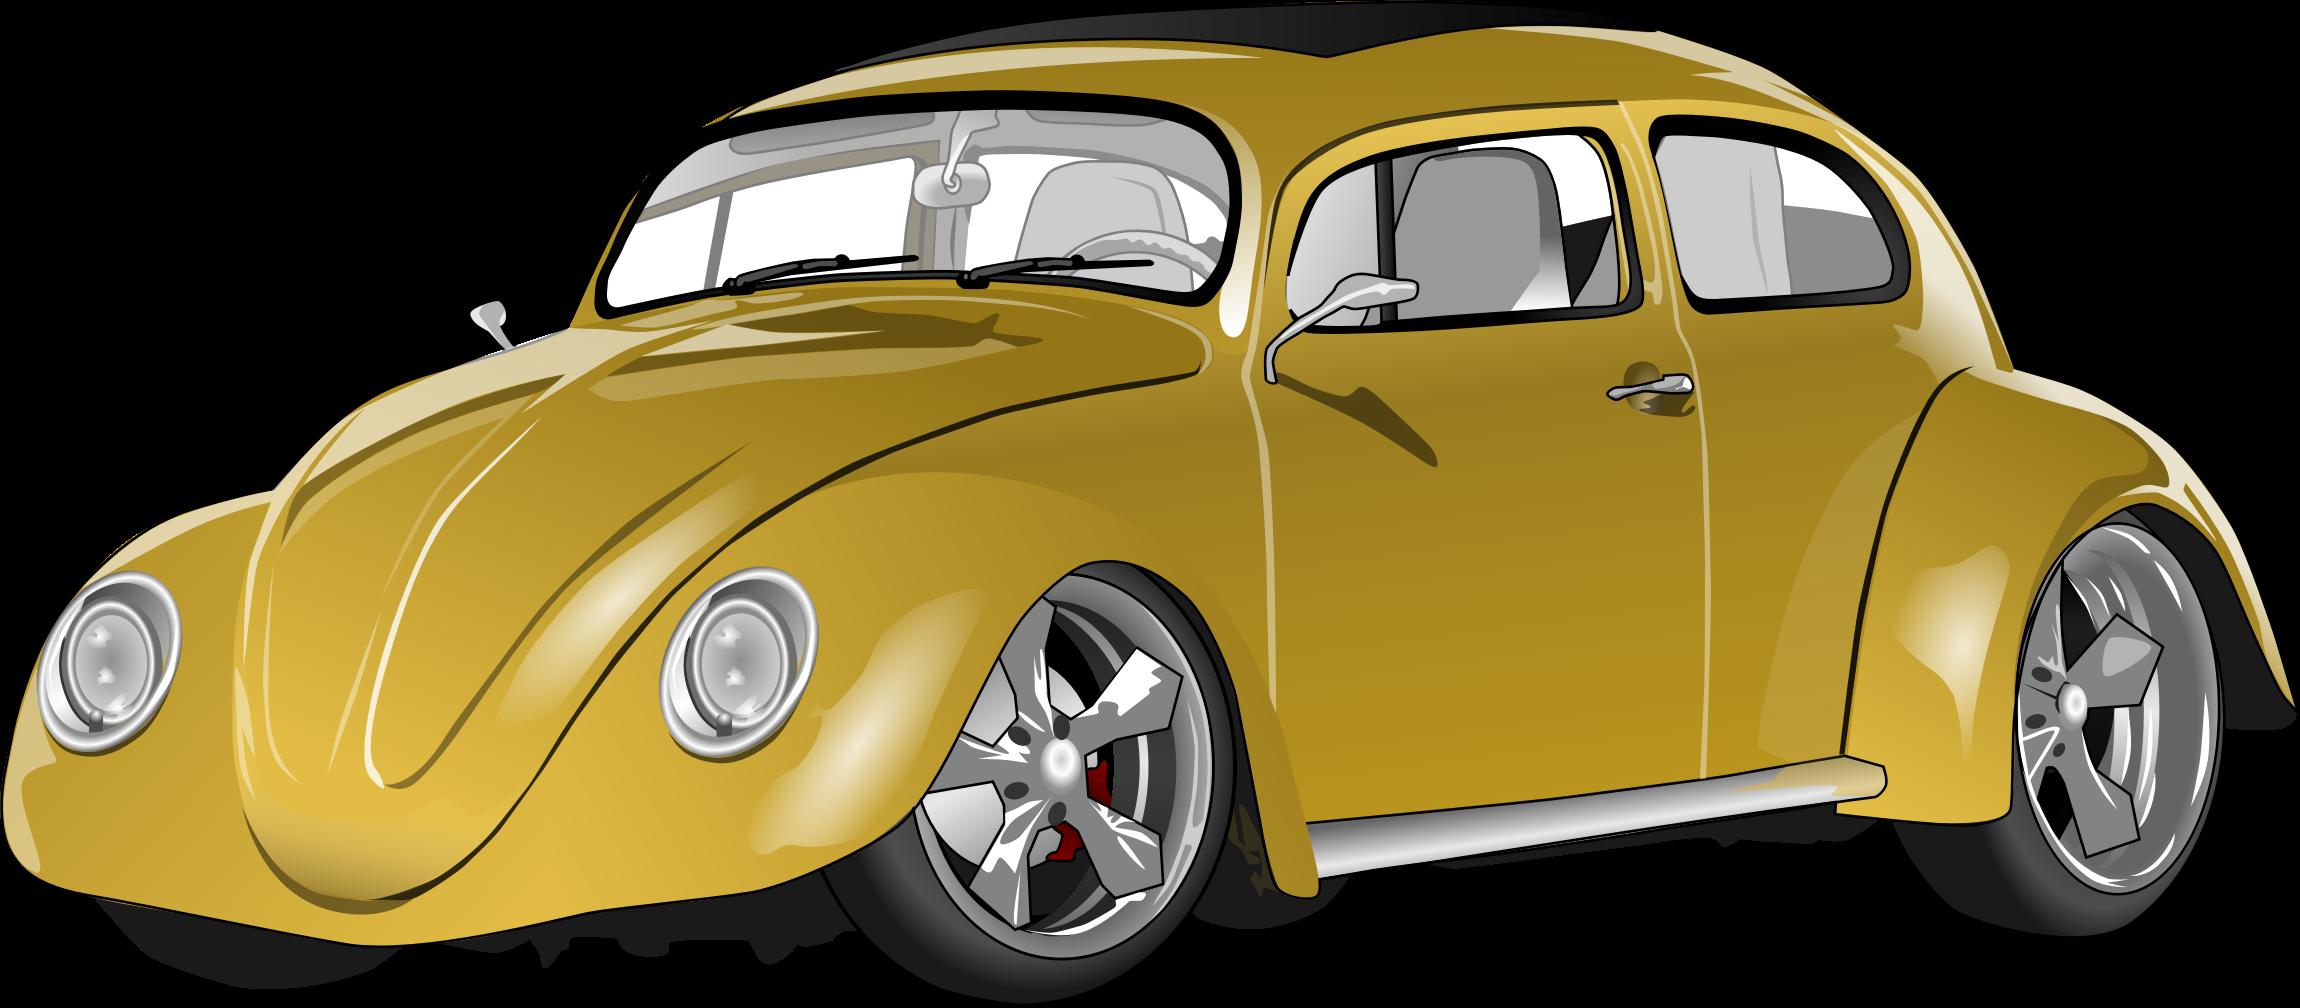 Vw big image png. Clipart car beetle